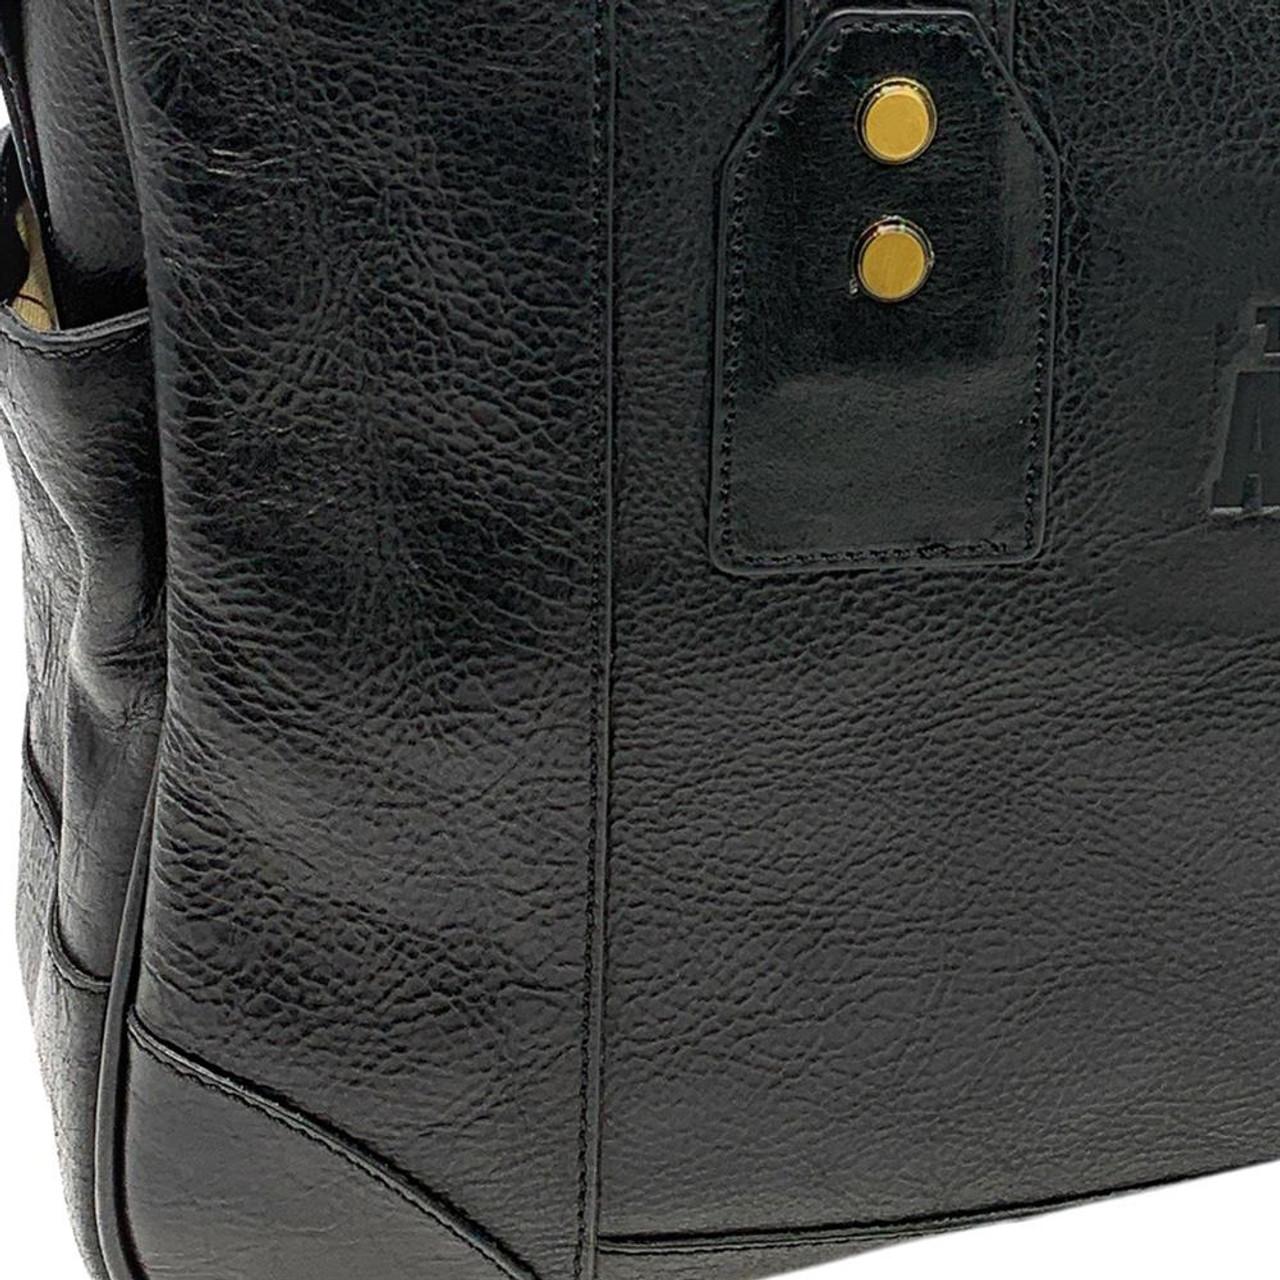 University of Florida Gators Business Case Black Genuine Leather